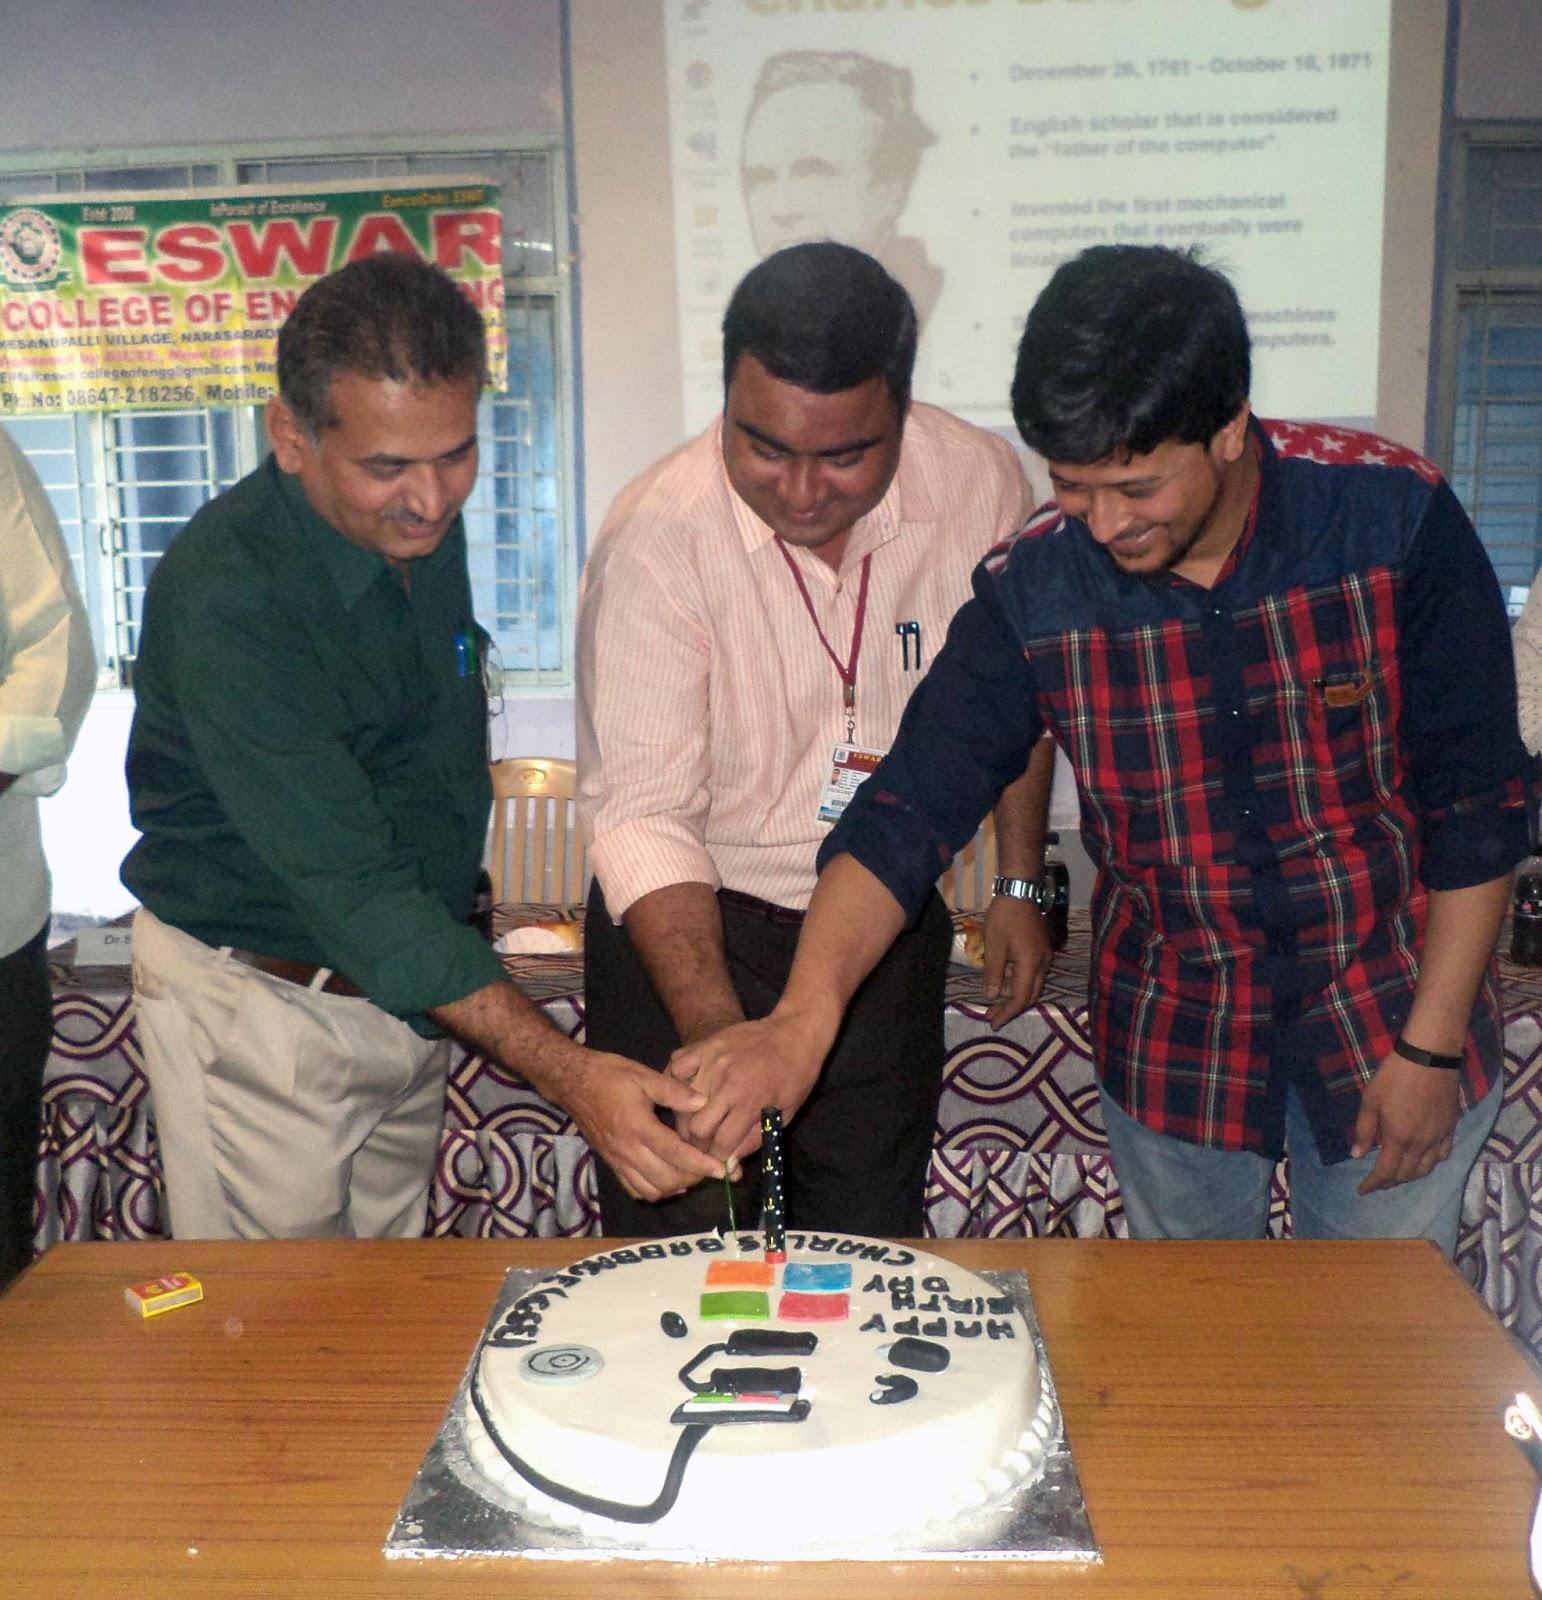 Eswar College of Engineering Blog: CHARLES BABBAGE BIRTH